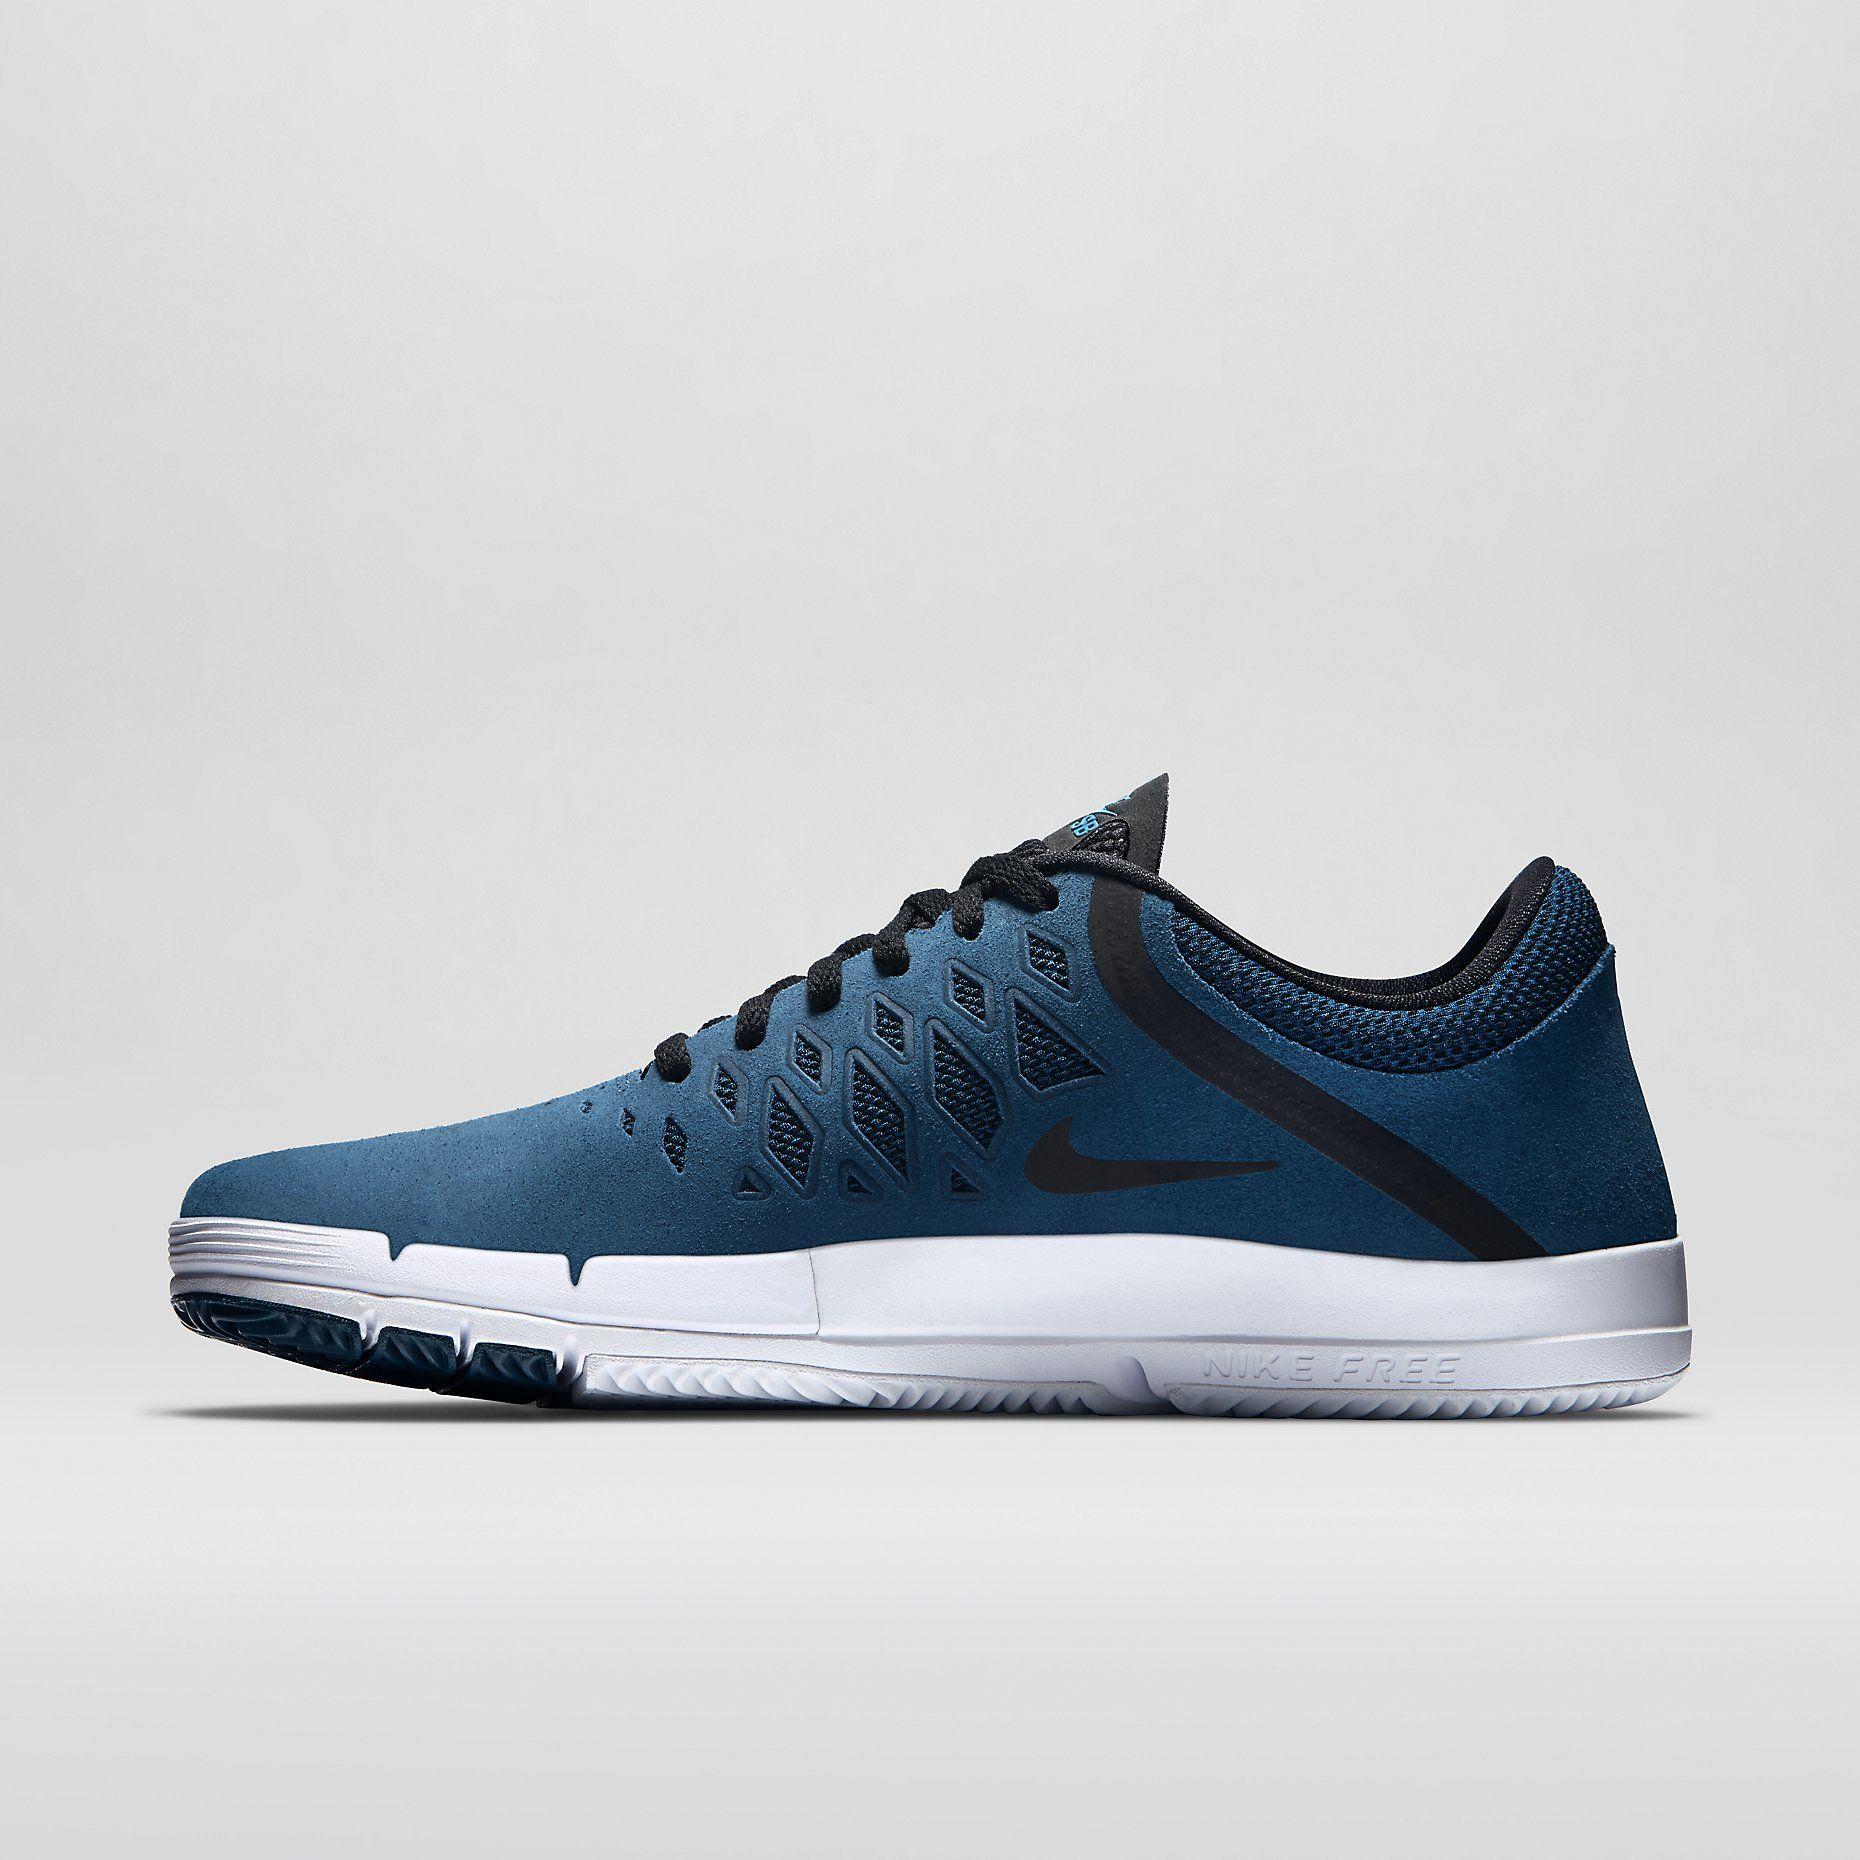 43ed0ce2915 Nike Free SB - Blue Force Blue Lagoon Sail Black